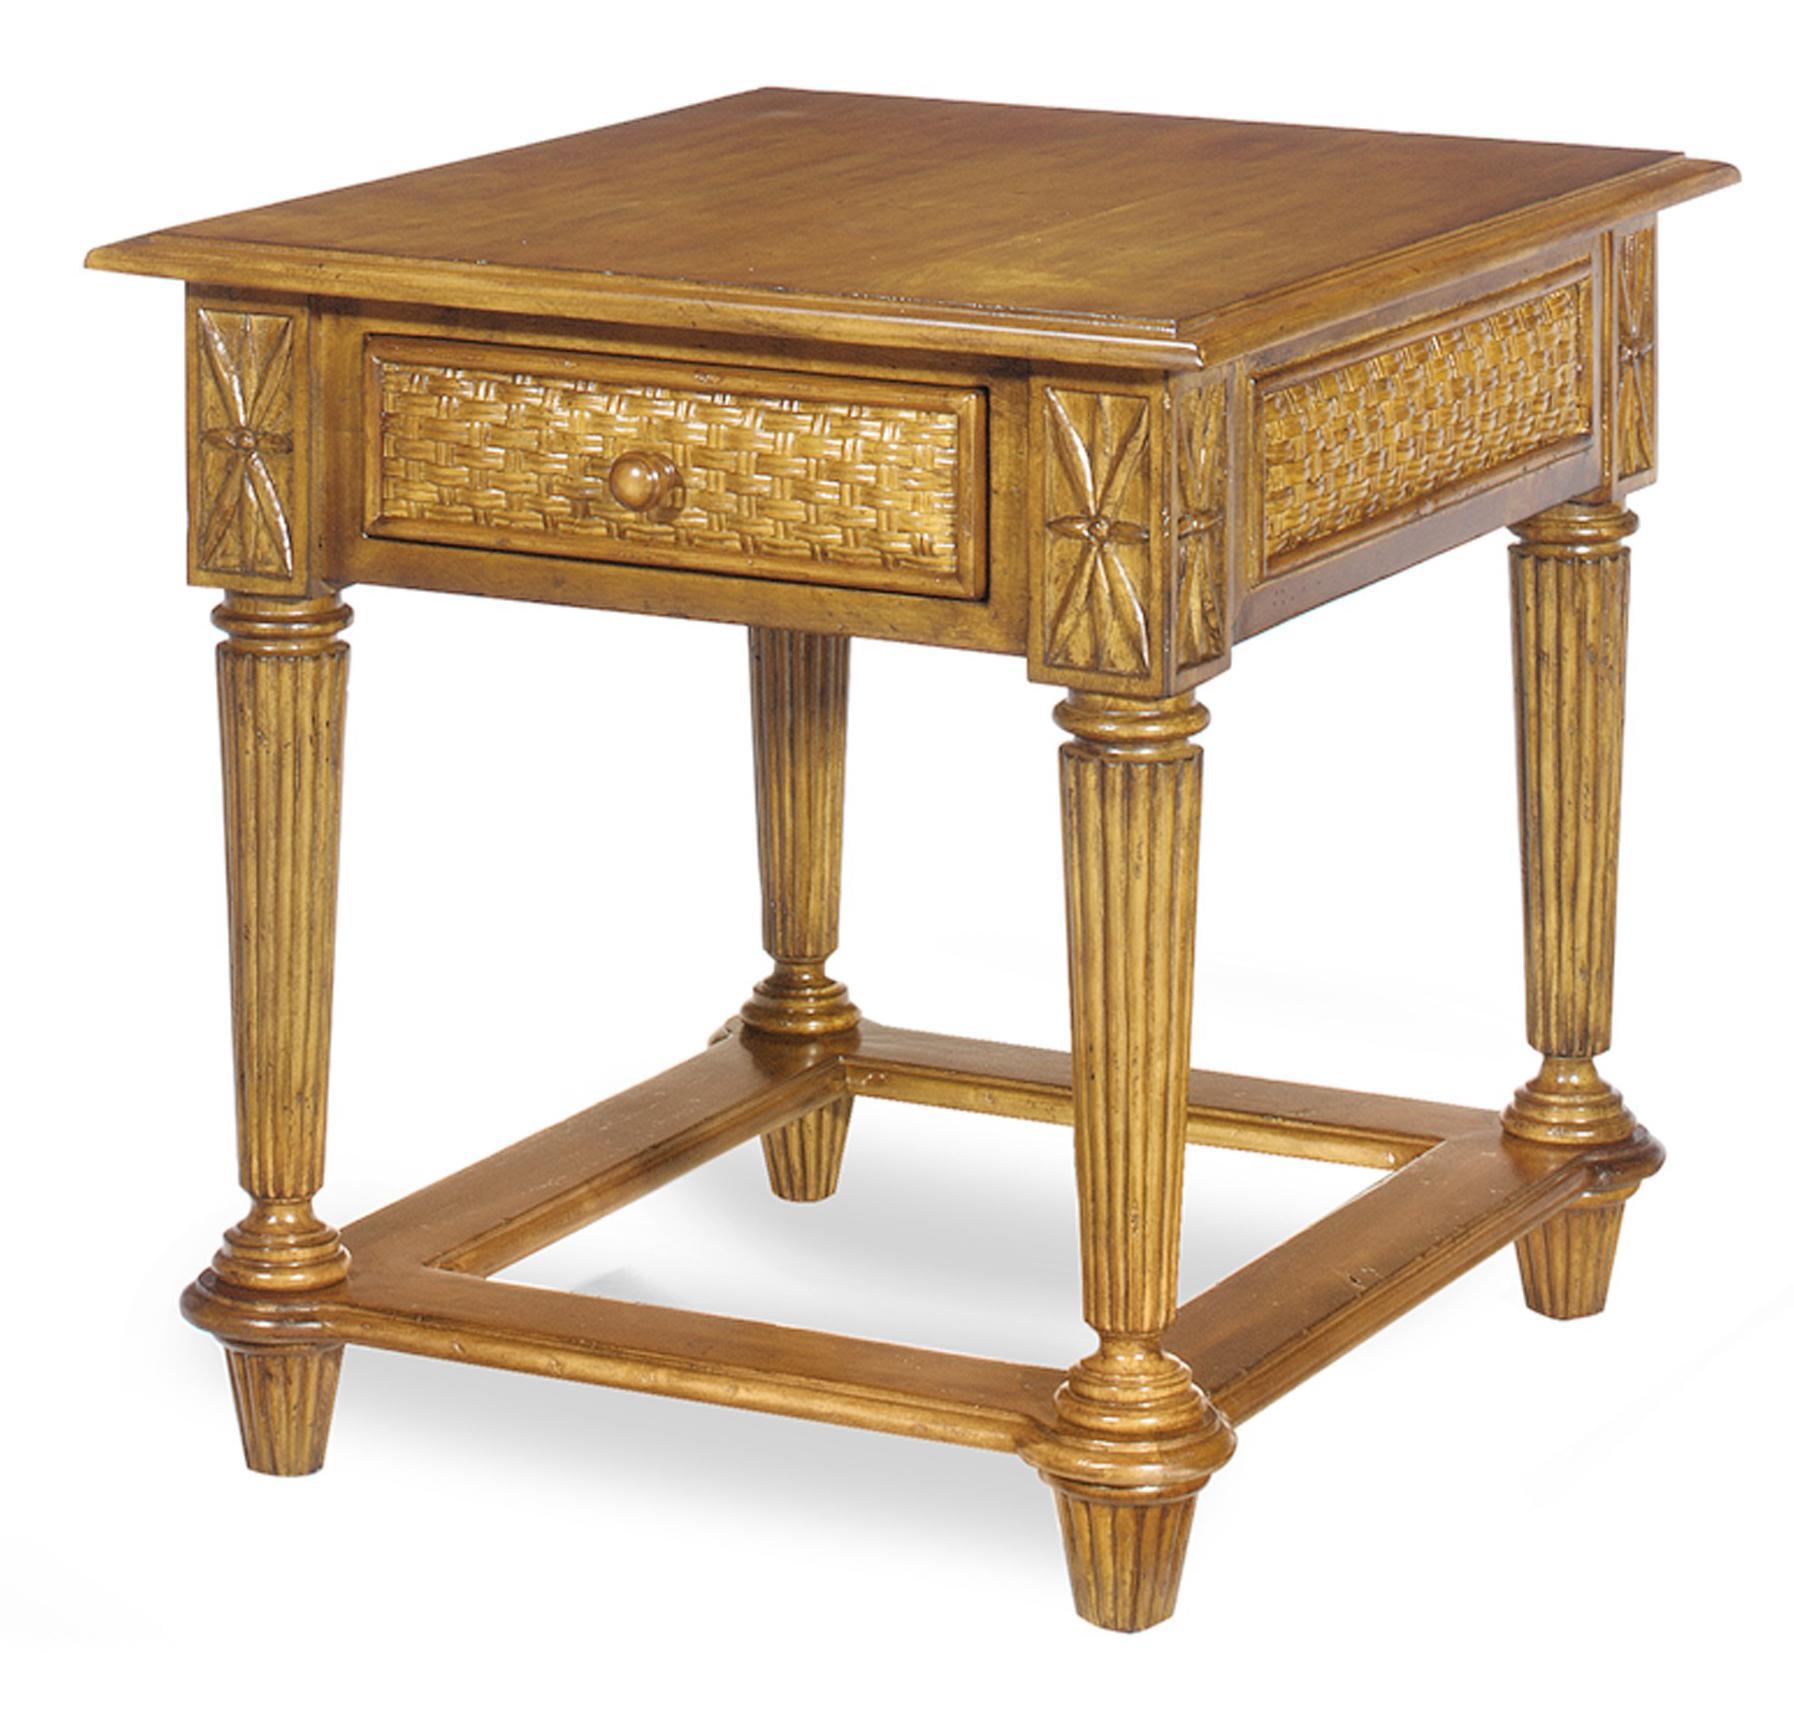 Craftmaster 340 End Table - Item Number: SE723